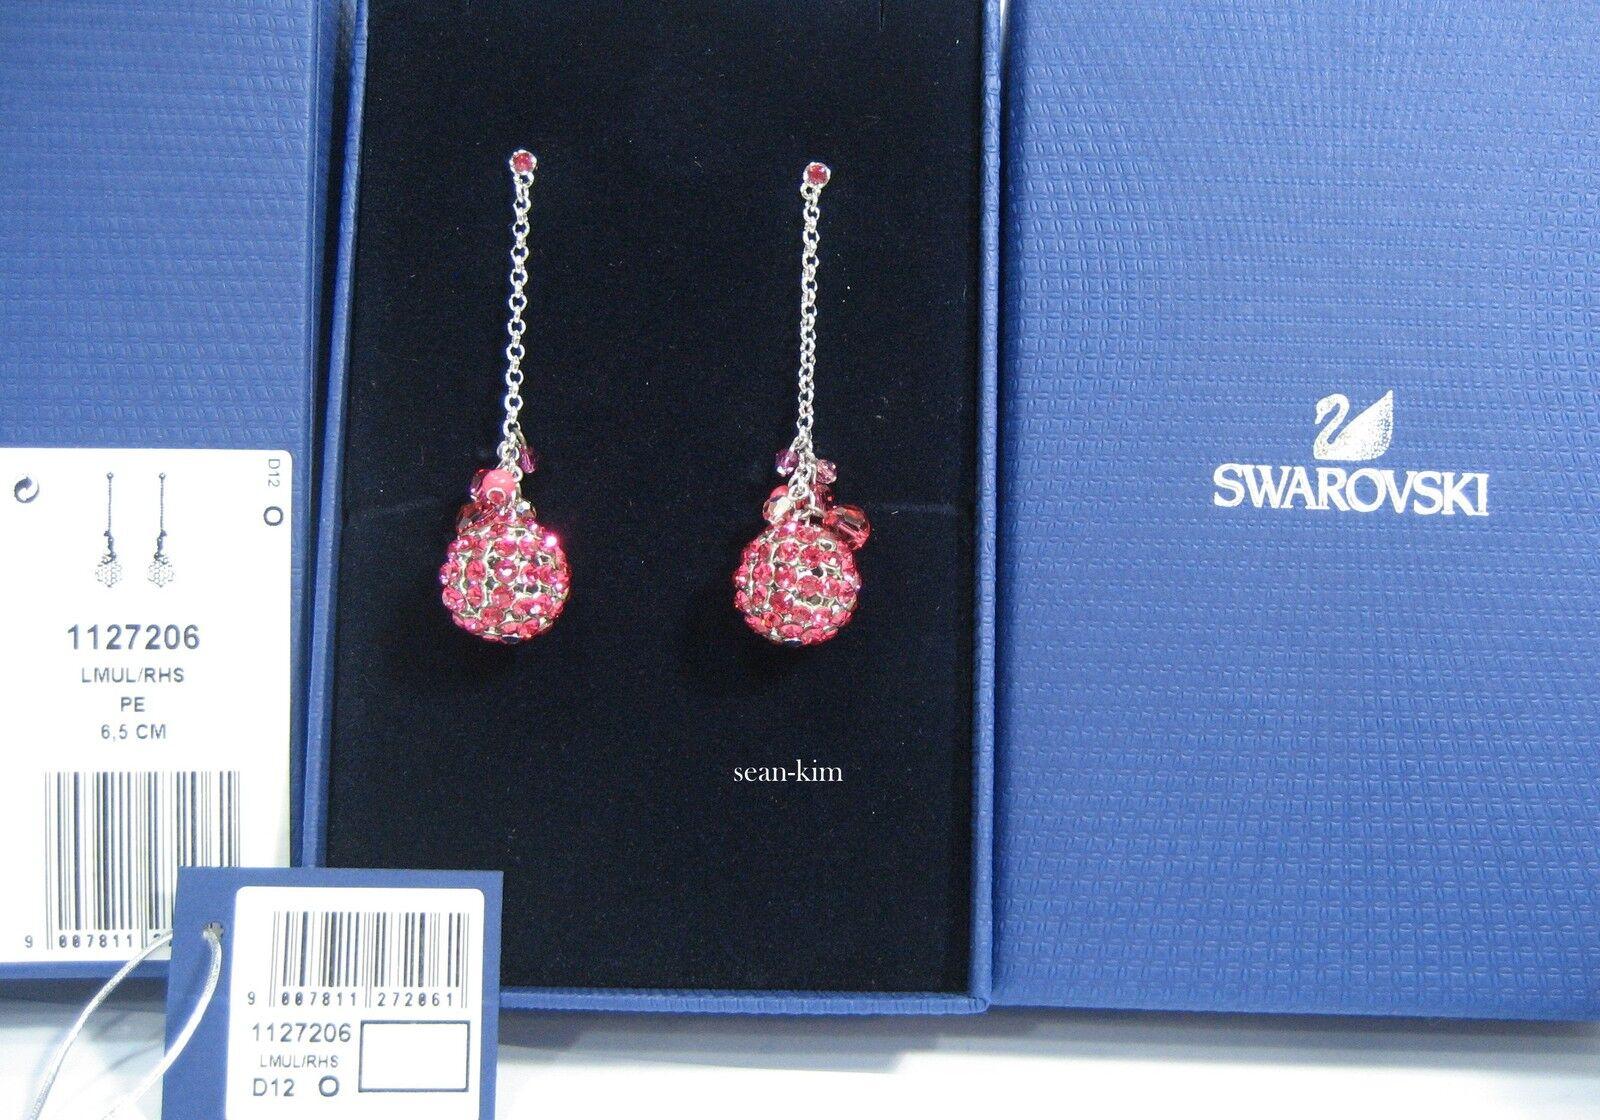 Swarovski Rhum Pierced Earraings Coral Pink Tones Crystal Crystal MIB - 1127206